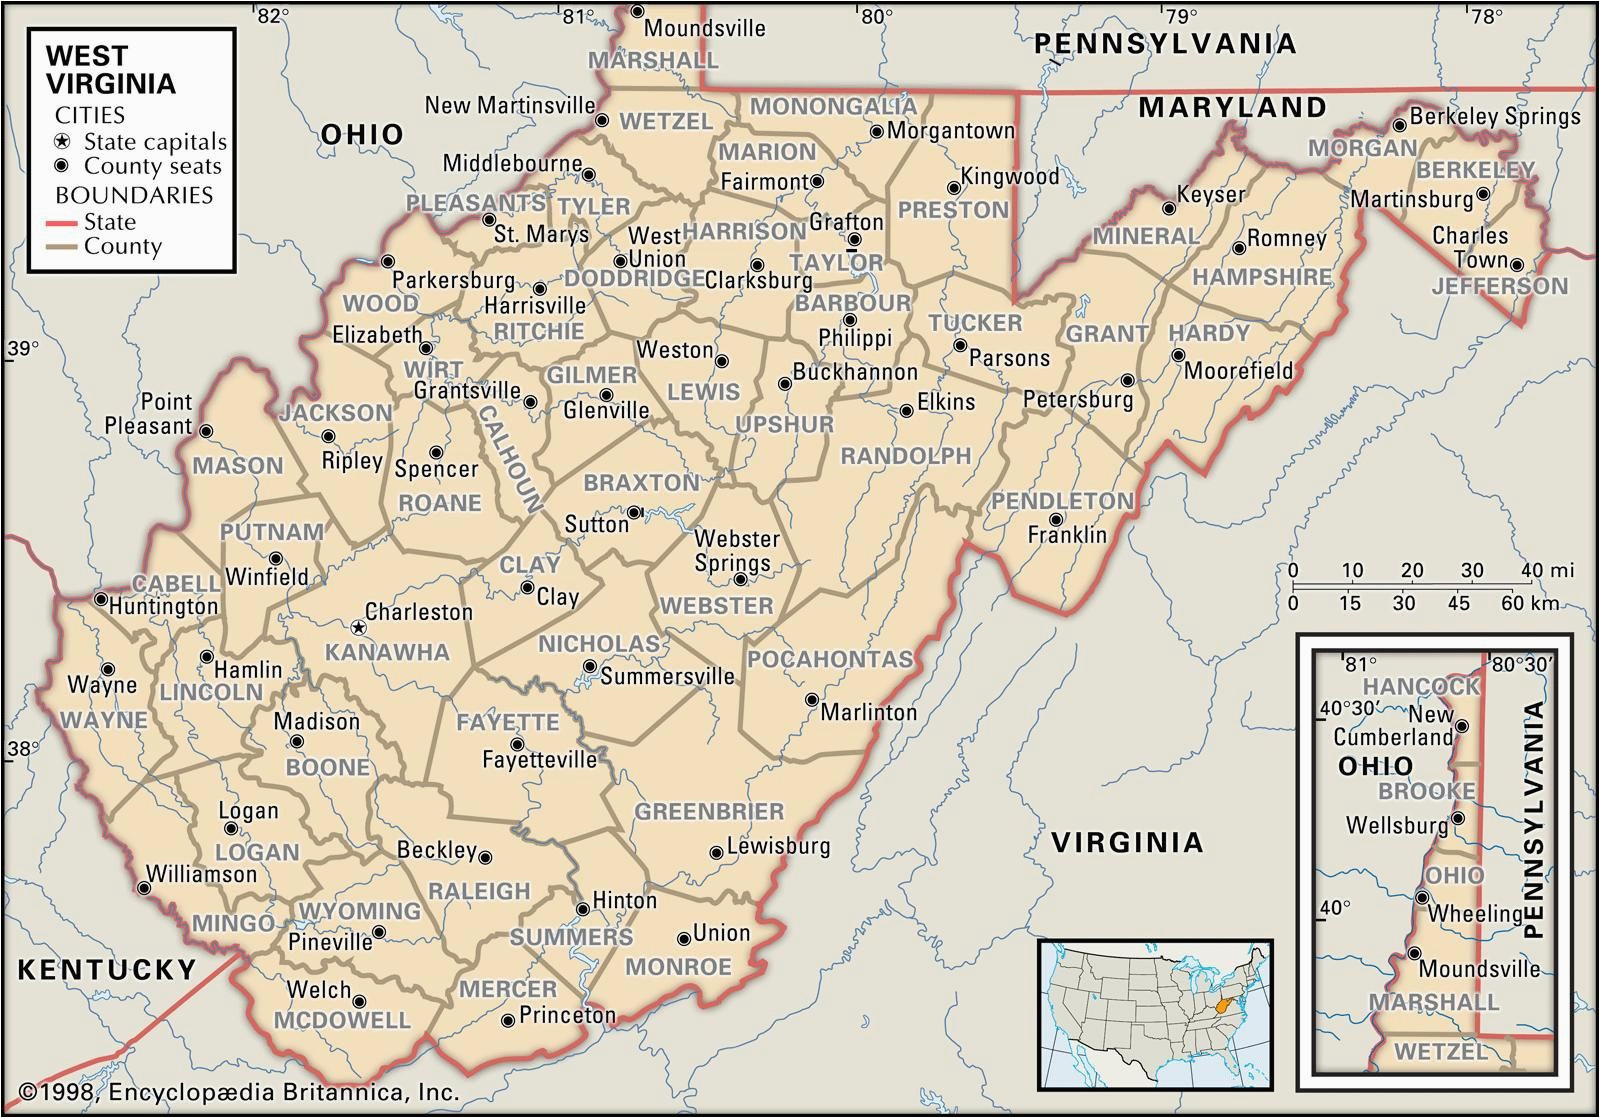 Ohio Wv Map south Carolina Maps 1700 S Google Search Genealogy Pinterest